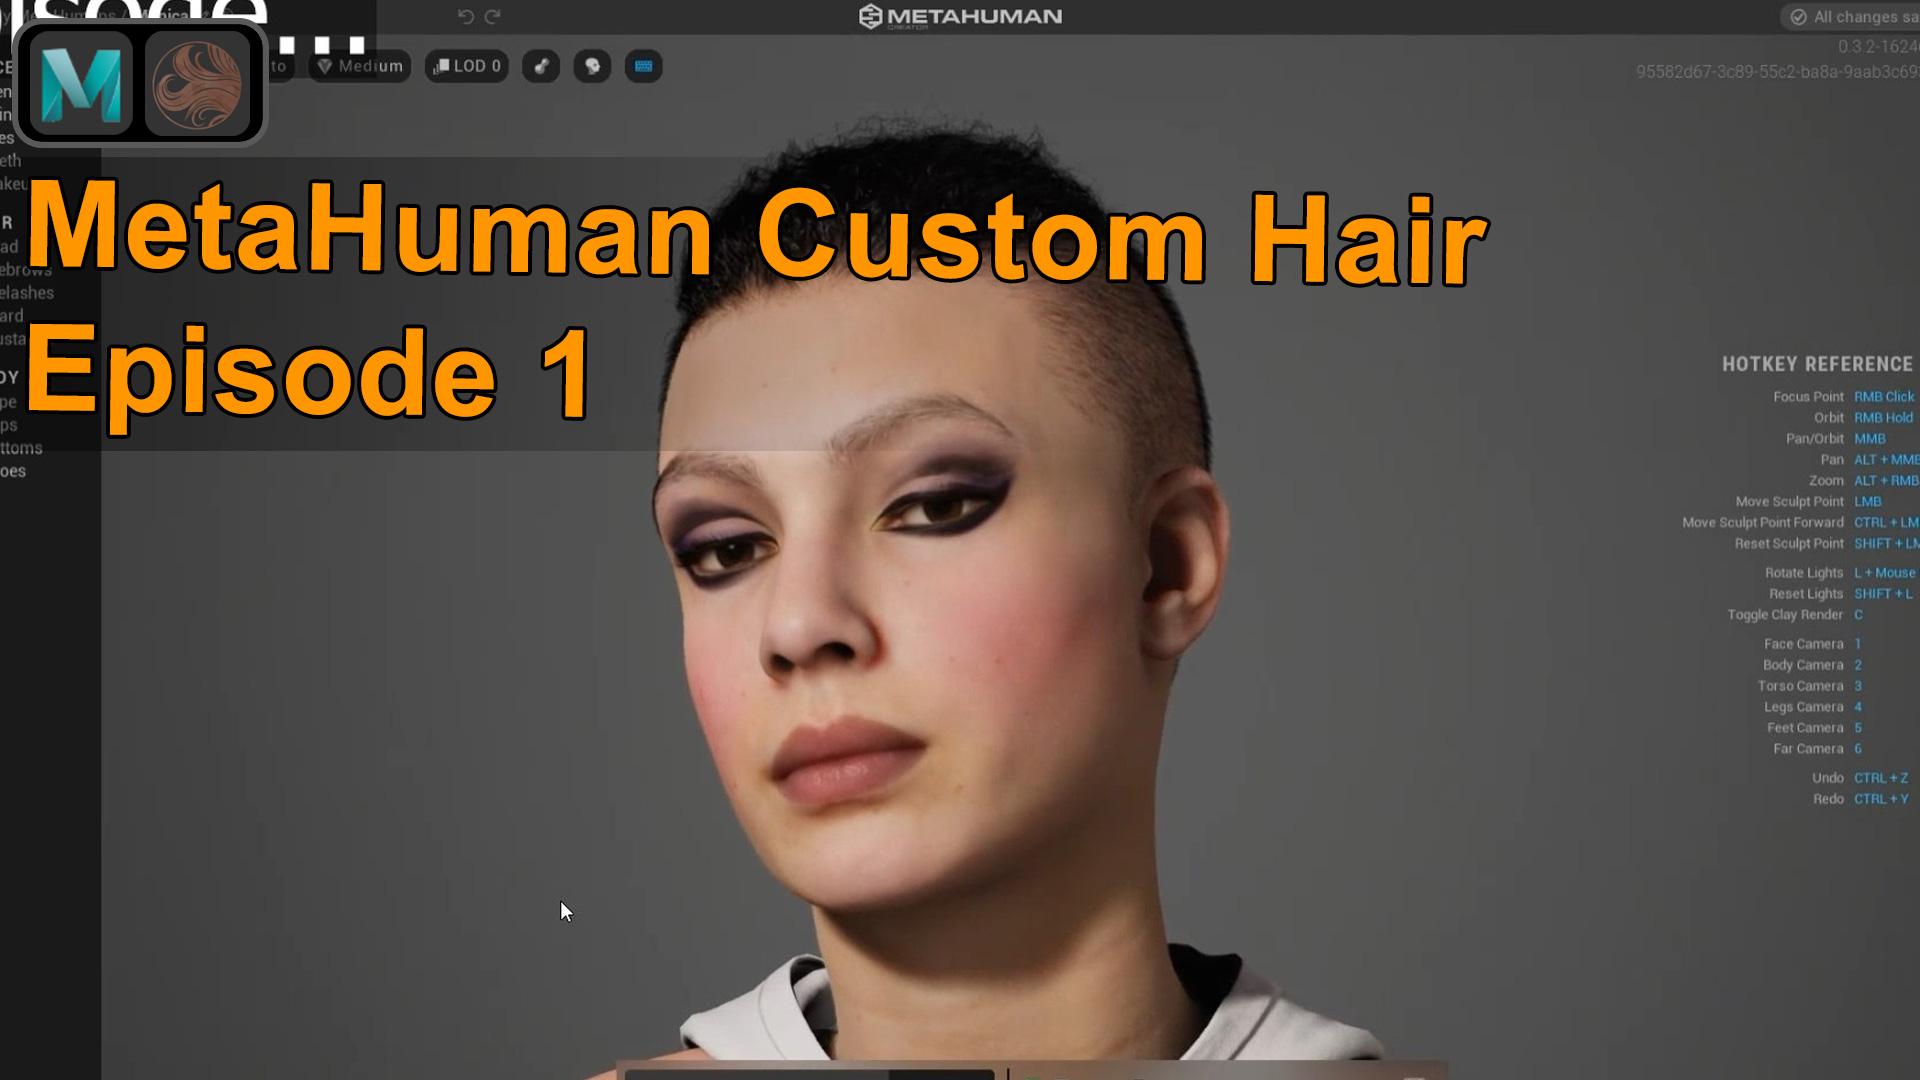 METAHUMAN_CUSTOM_HAIR_EP1.jpg